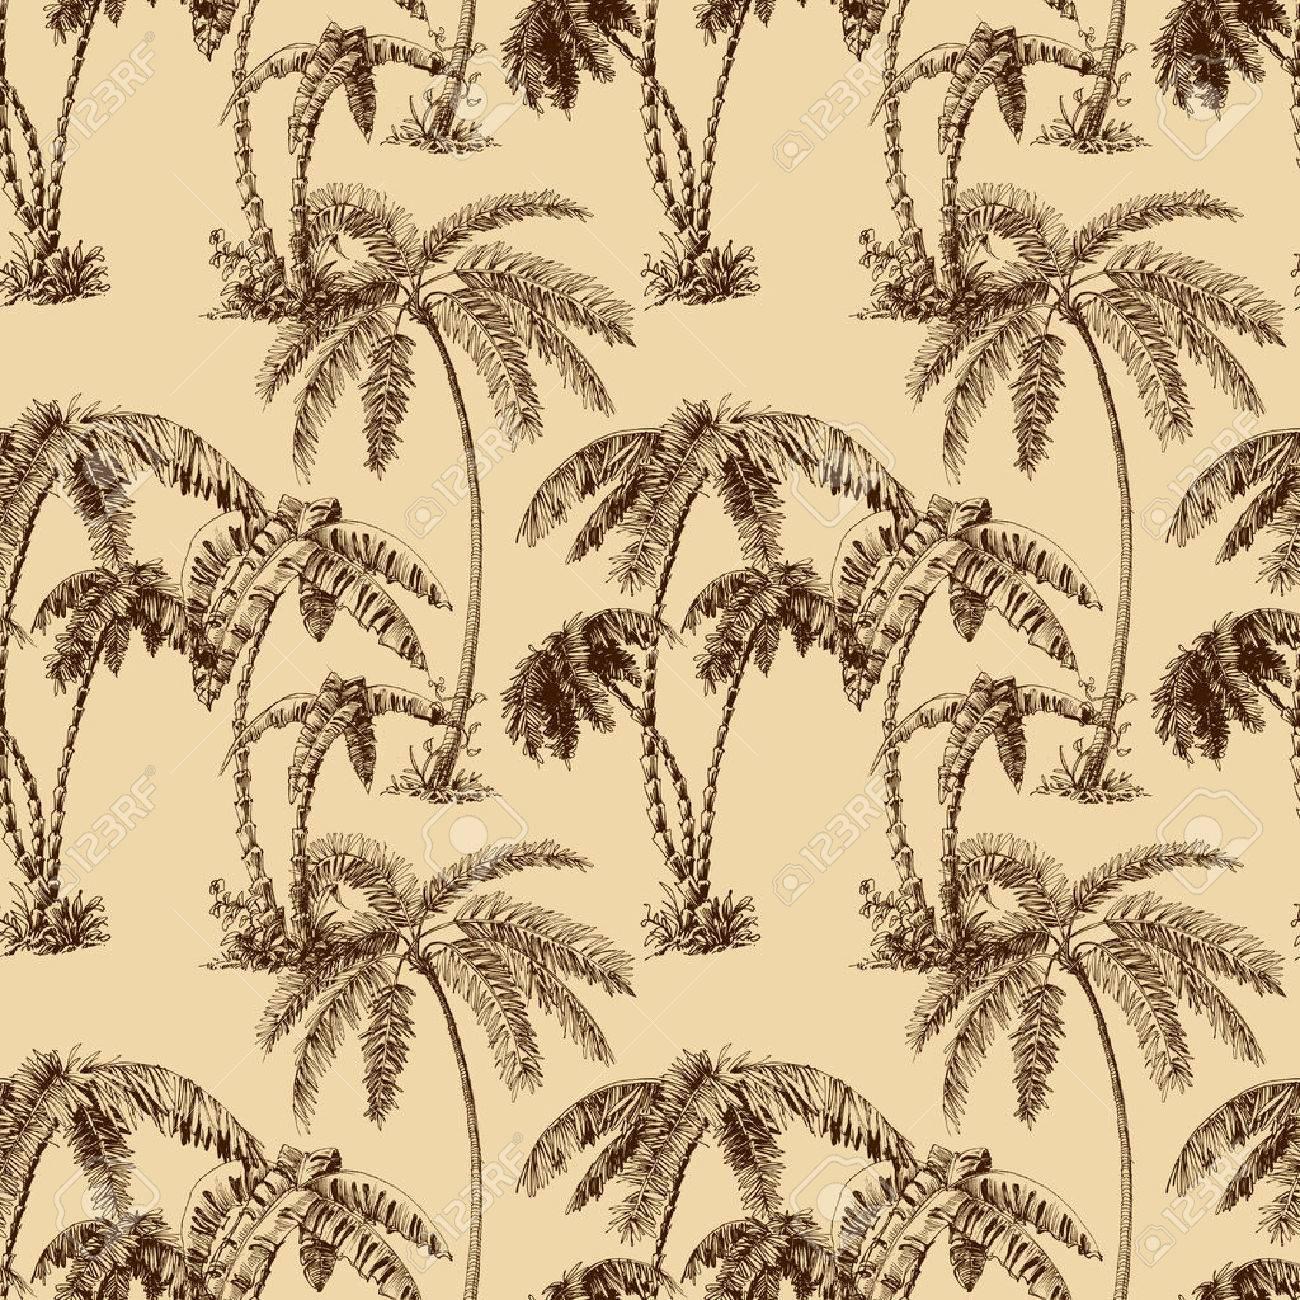 Palm trees seamless pattern - 43124910